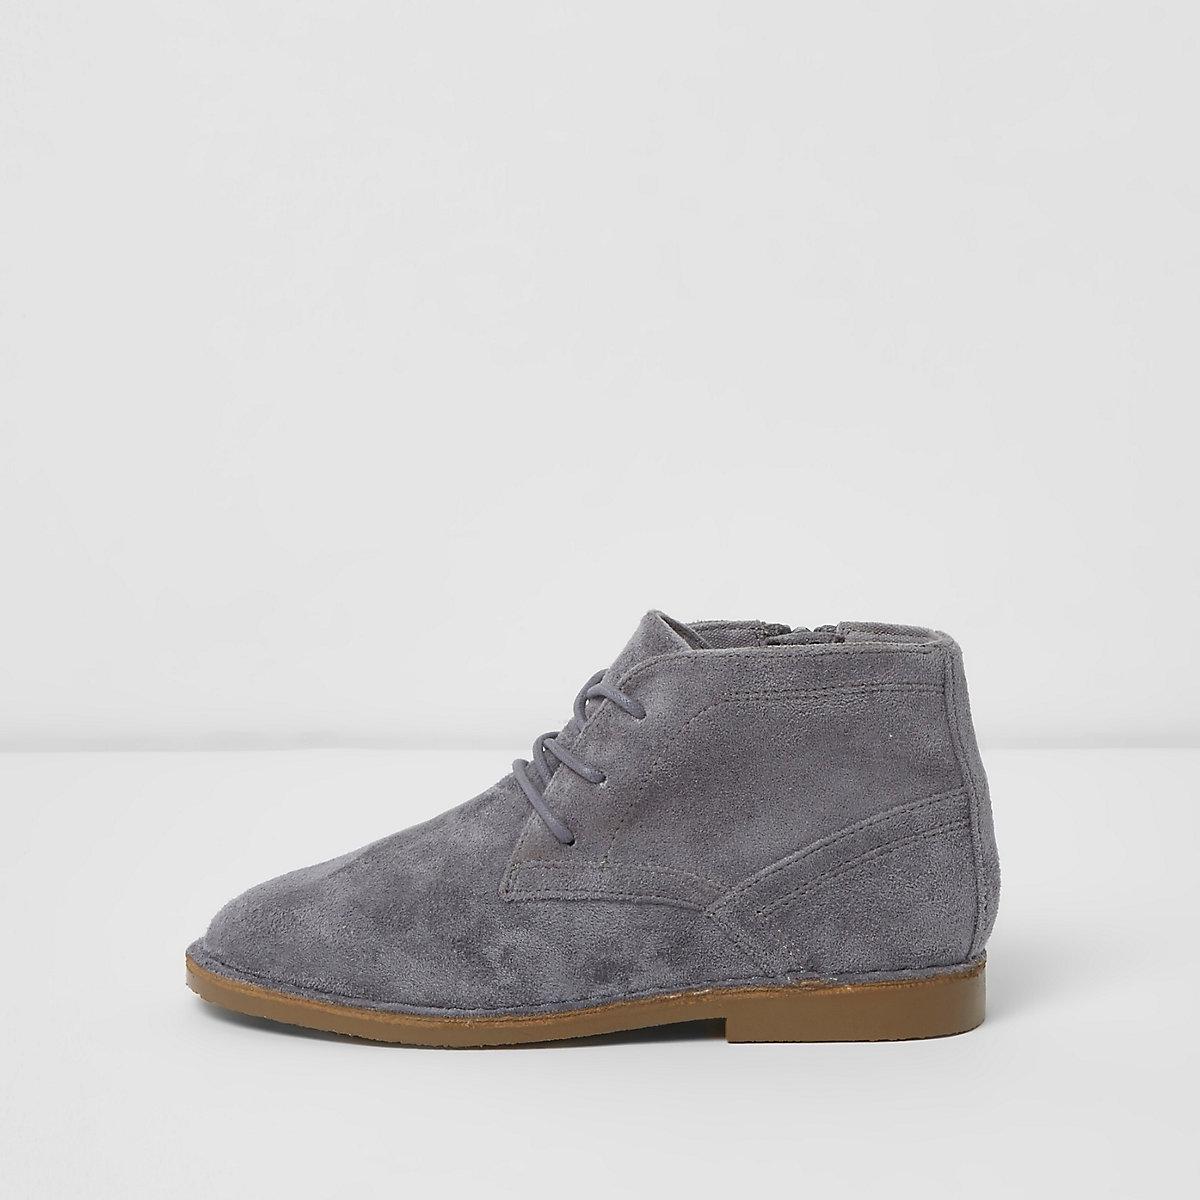 Boys grey faux suede desert boots